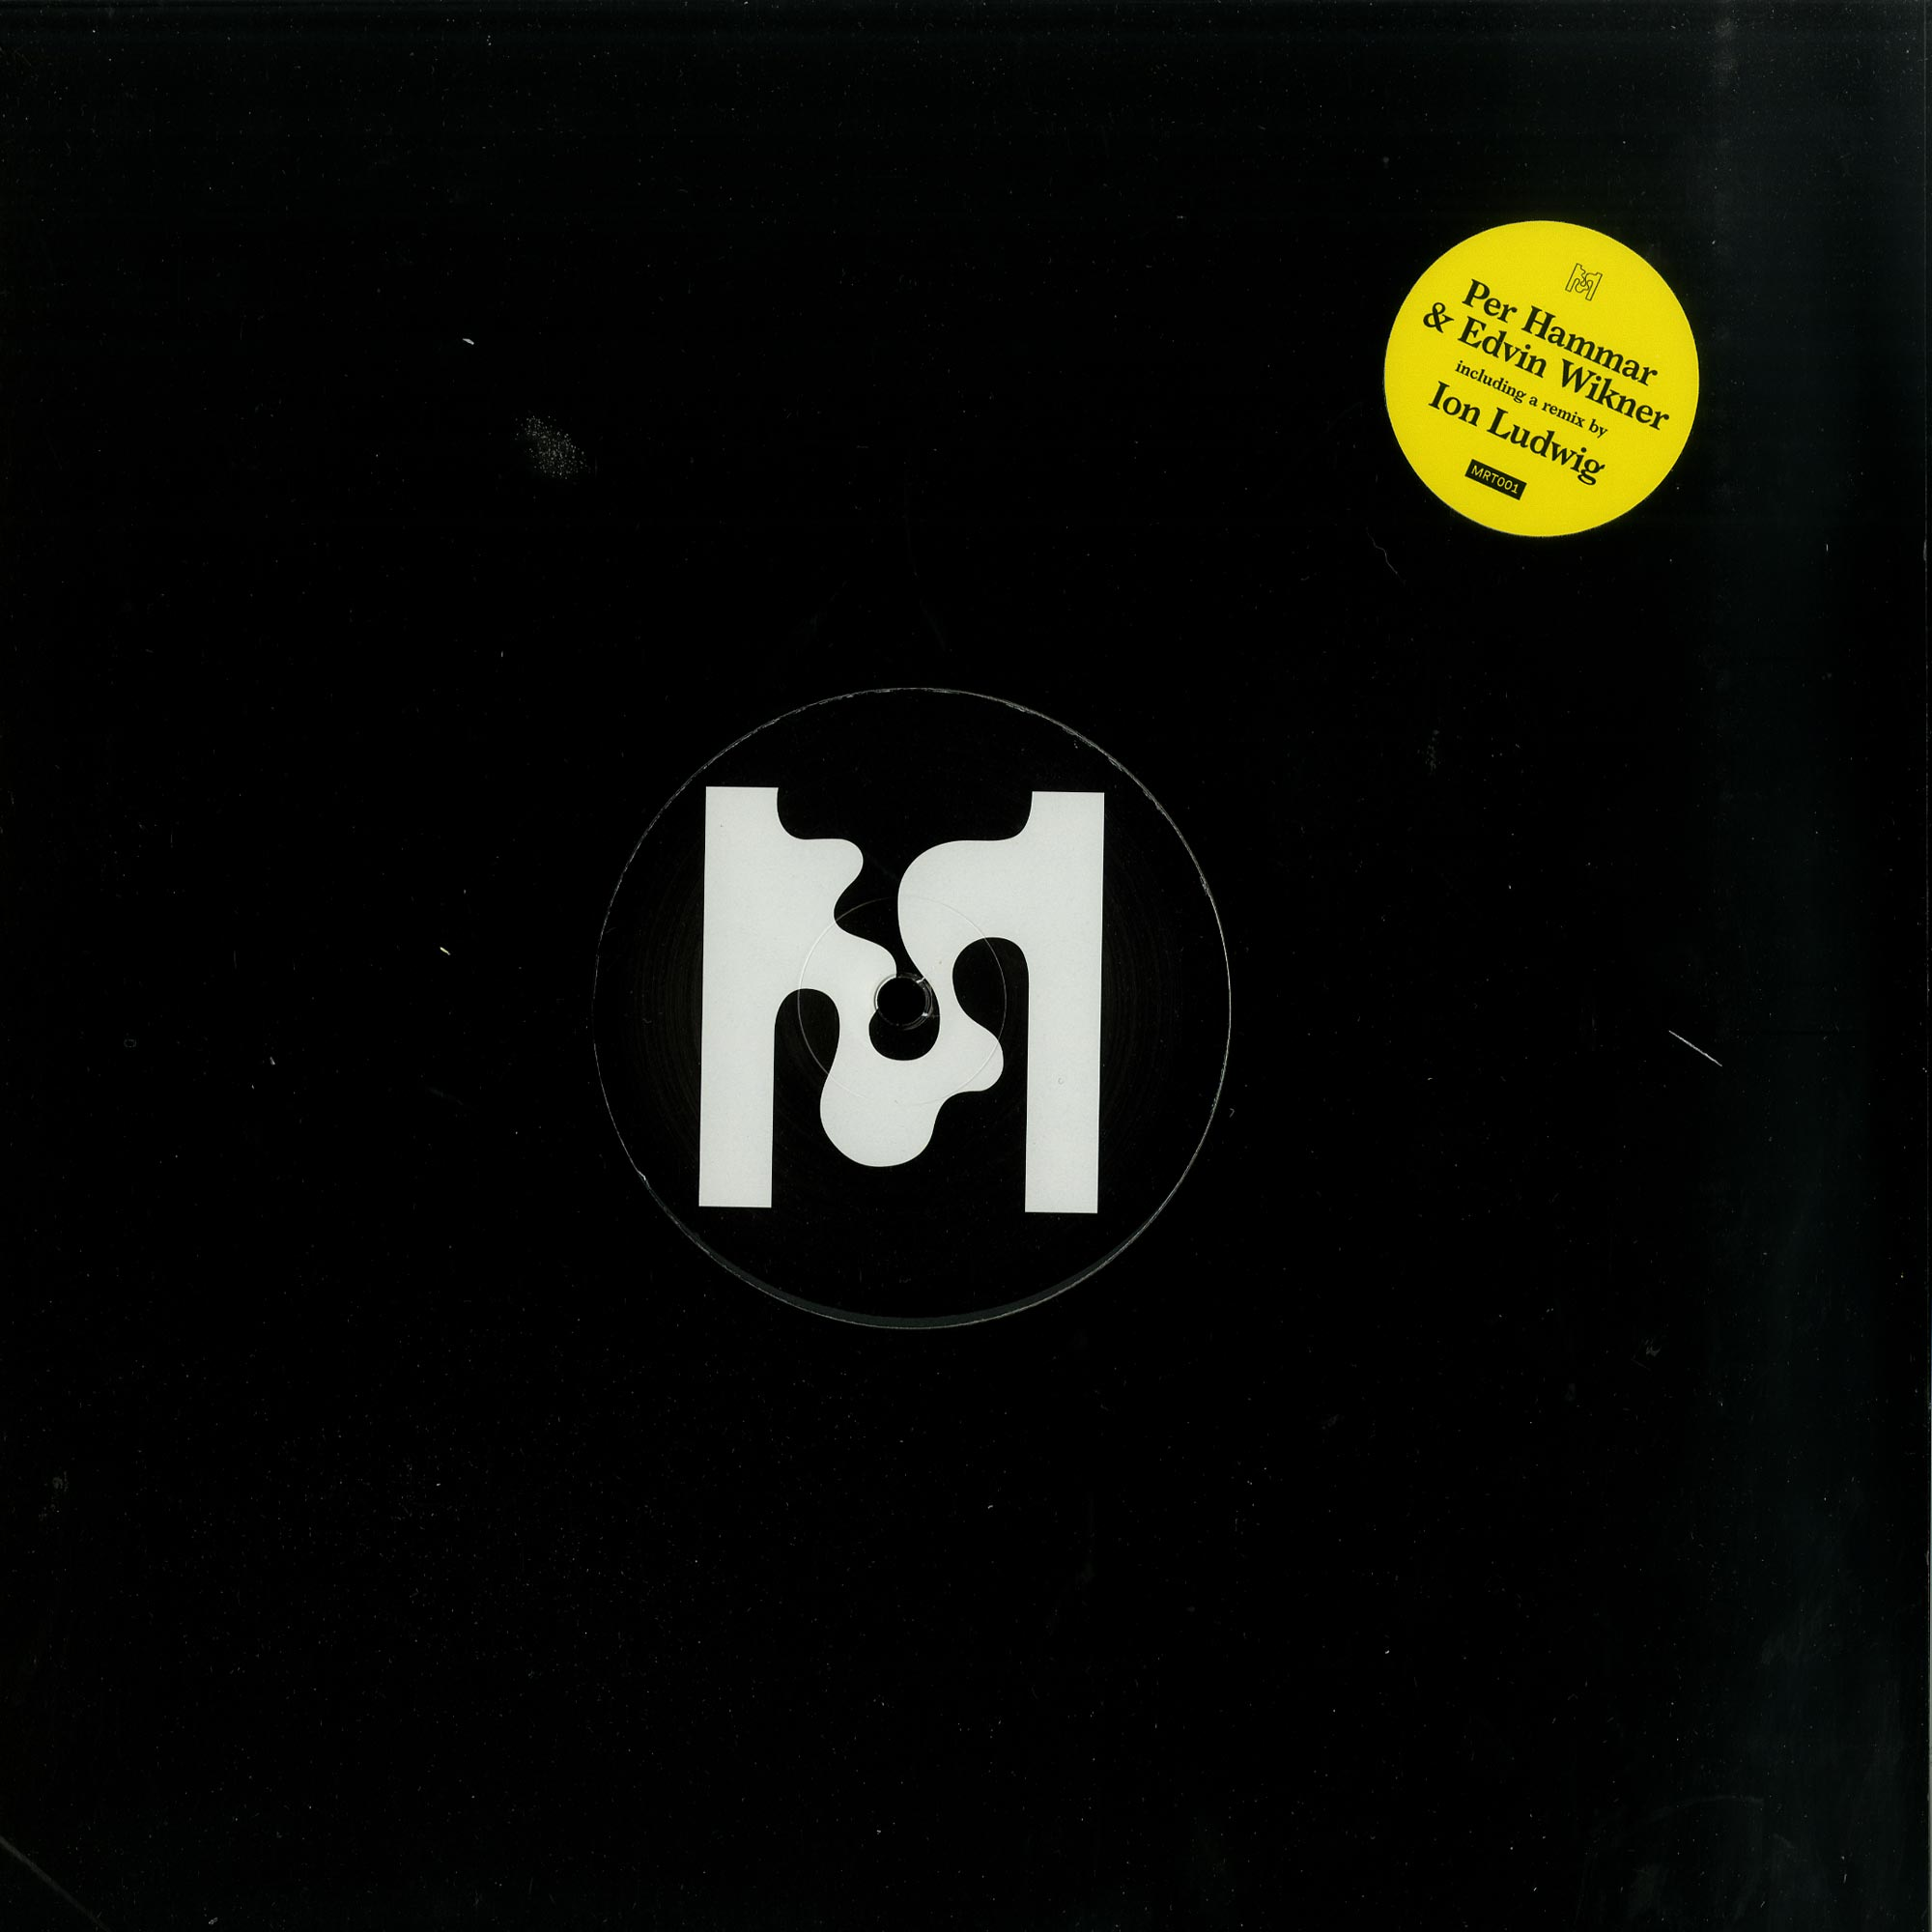 Per Hammar & Edvin Wikner - LINDSTROEM EP